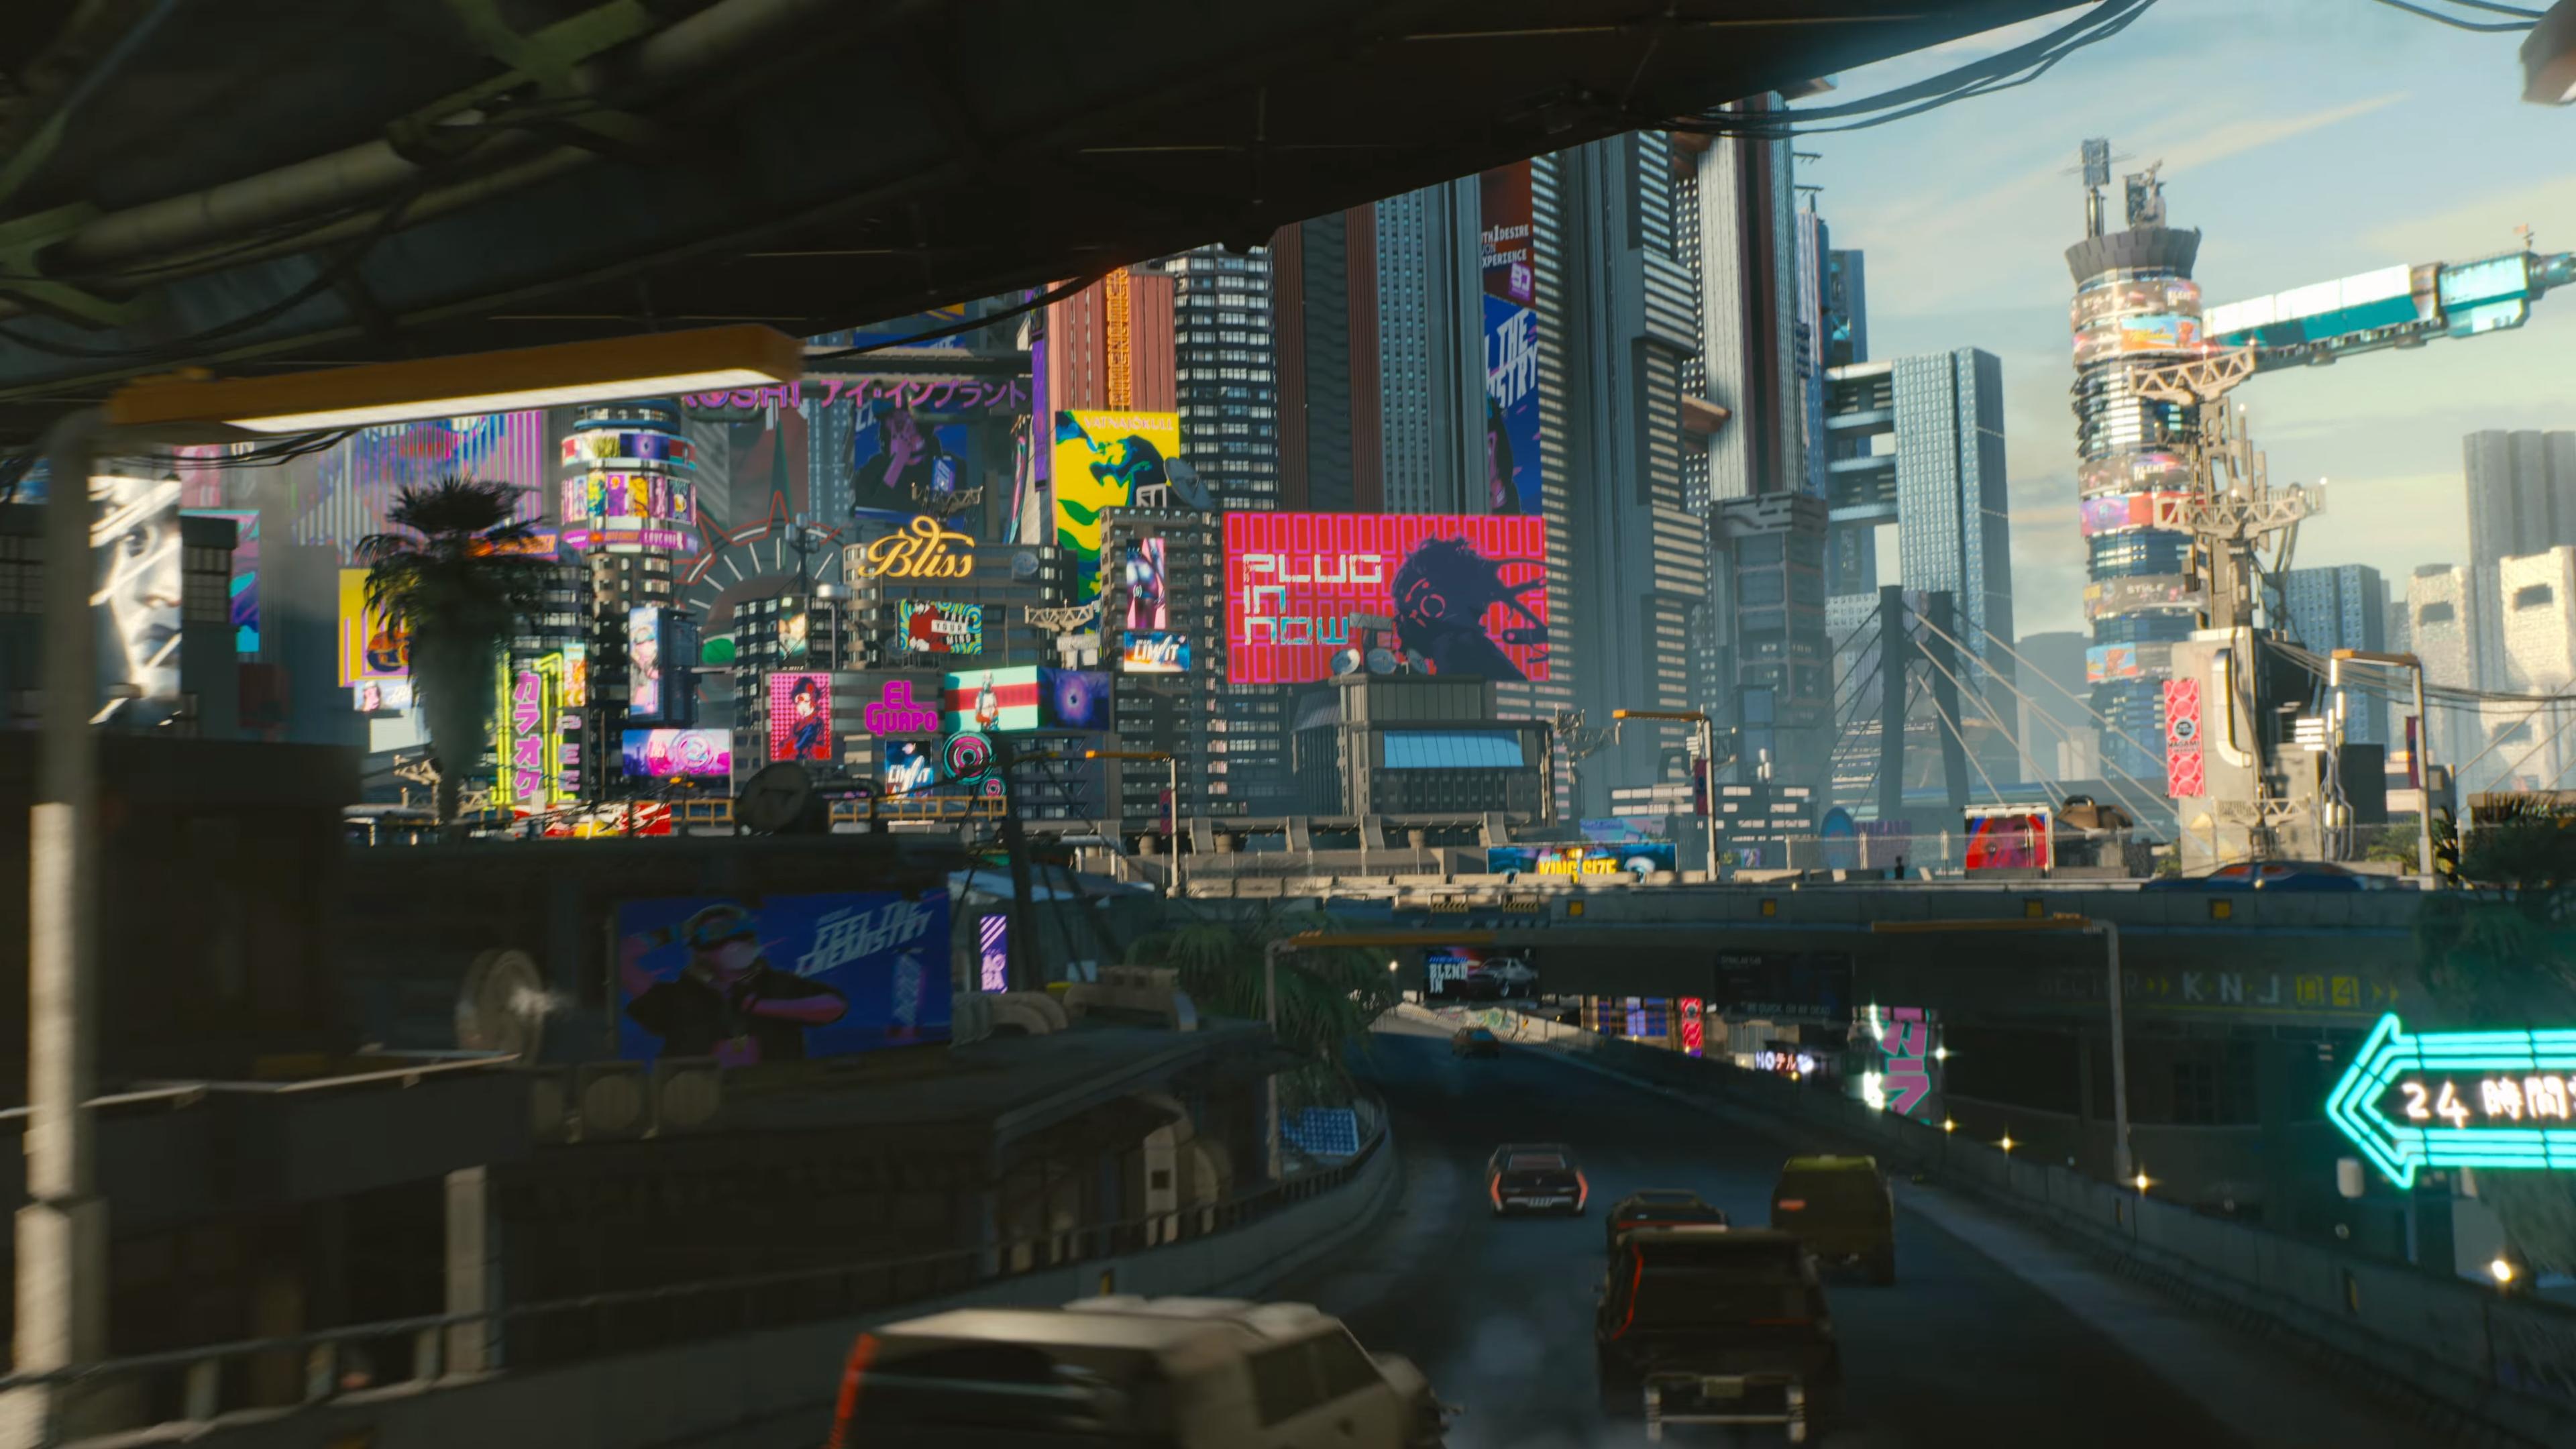 Cyberpunk 2077 City Wallpaper: Wallpaper : Cyberpunk, Cyberpunk 2077 3840x2160